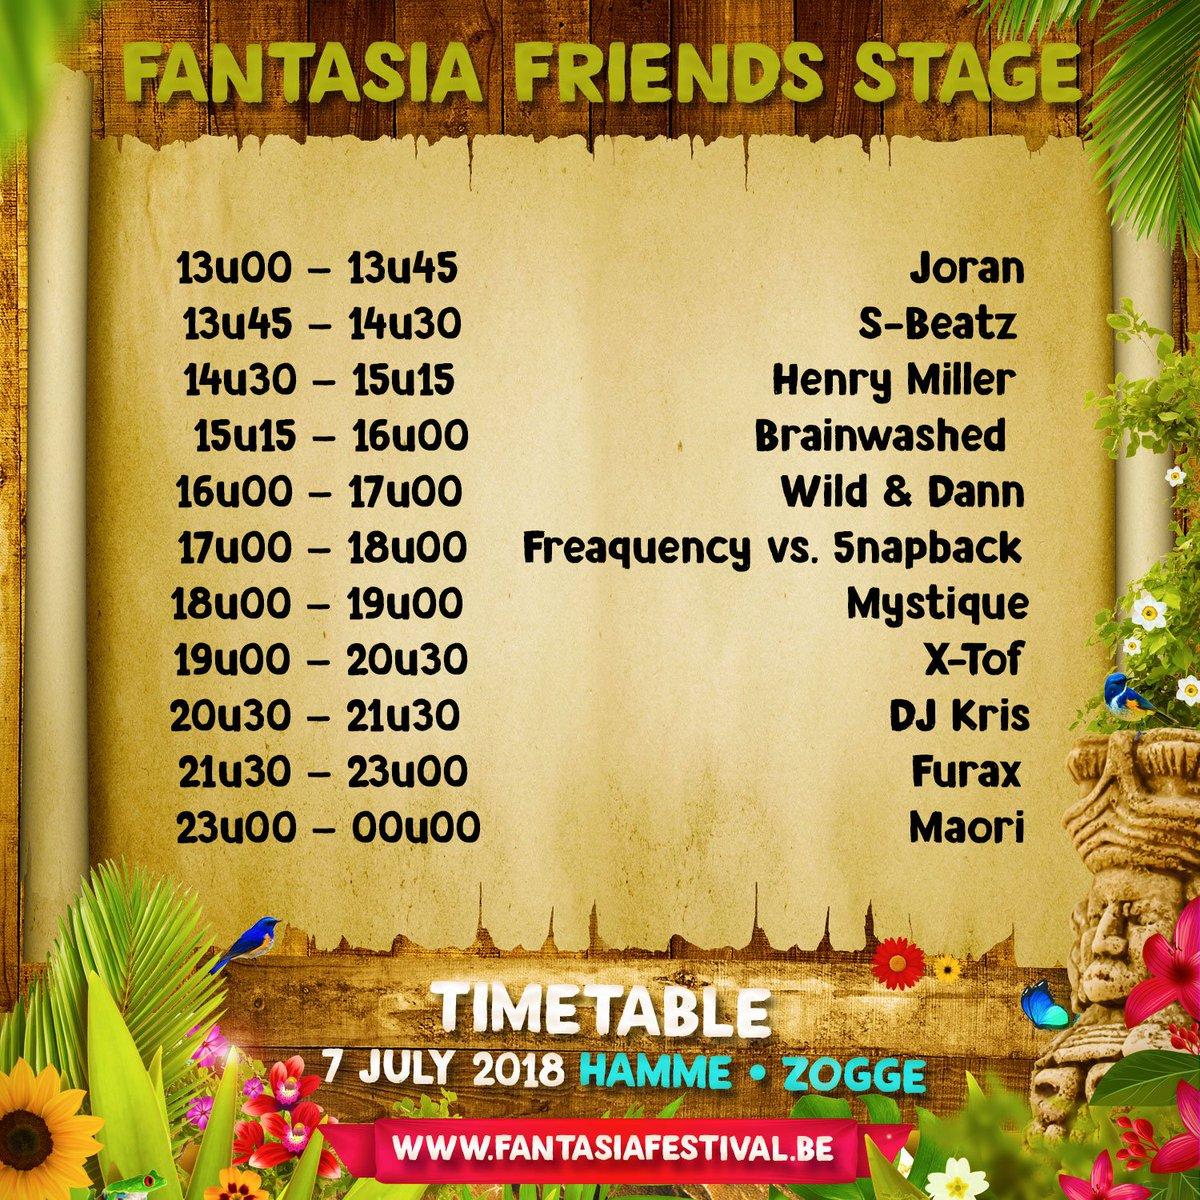 6d118f808 ... quarterfinals live on the Fantasia Friends Stage.  FantasiaFestival2018   spreadtheword  share  tag  timetable fantasiafriendspic.twitter .com 3cnU5NFVOL